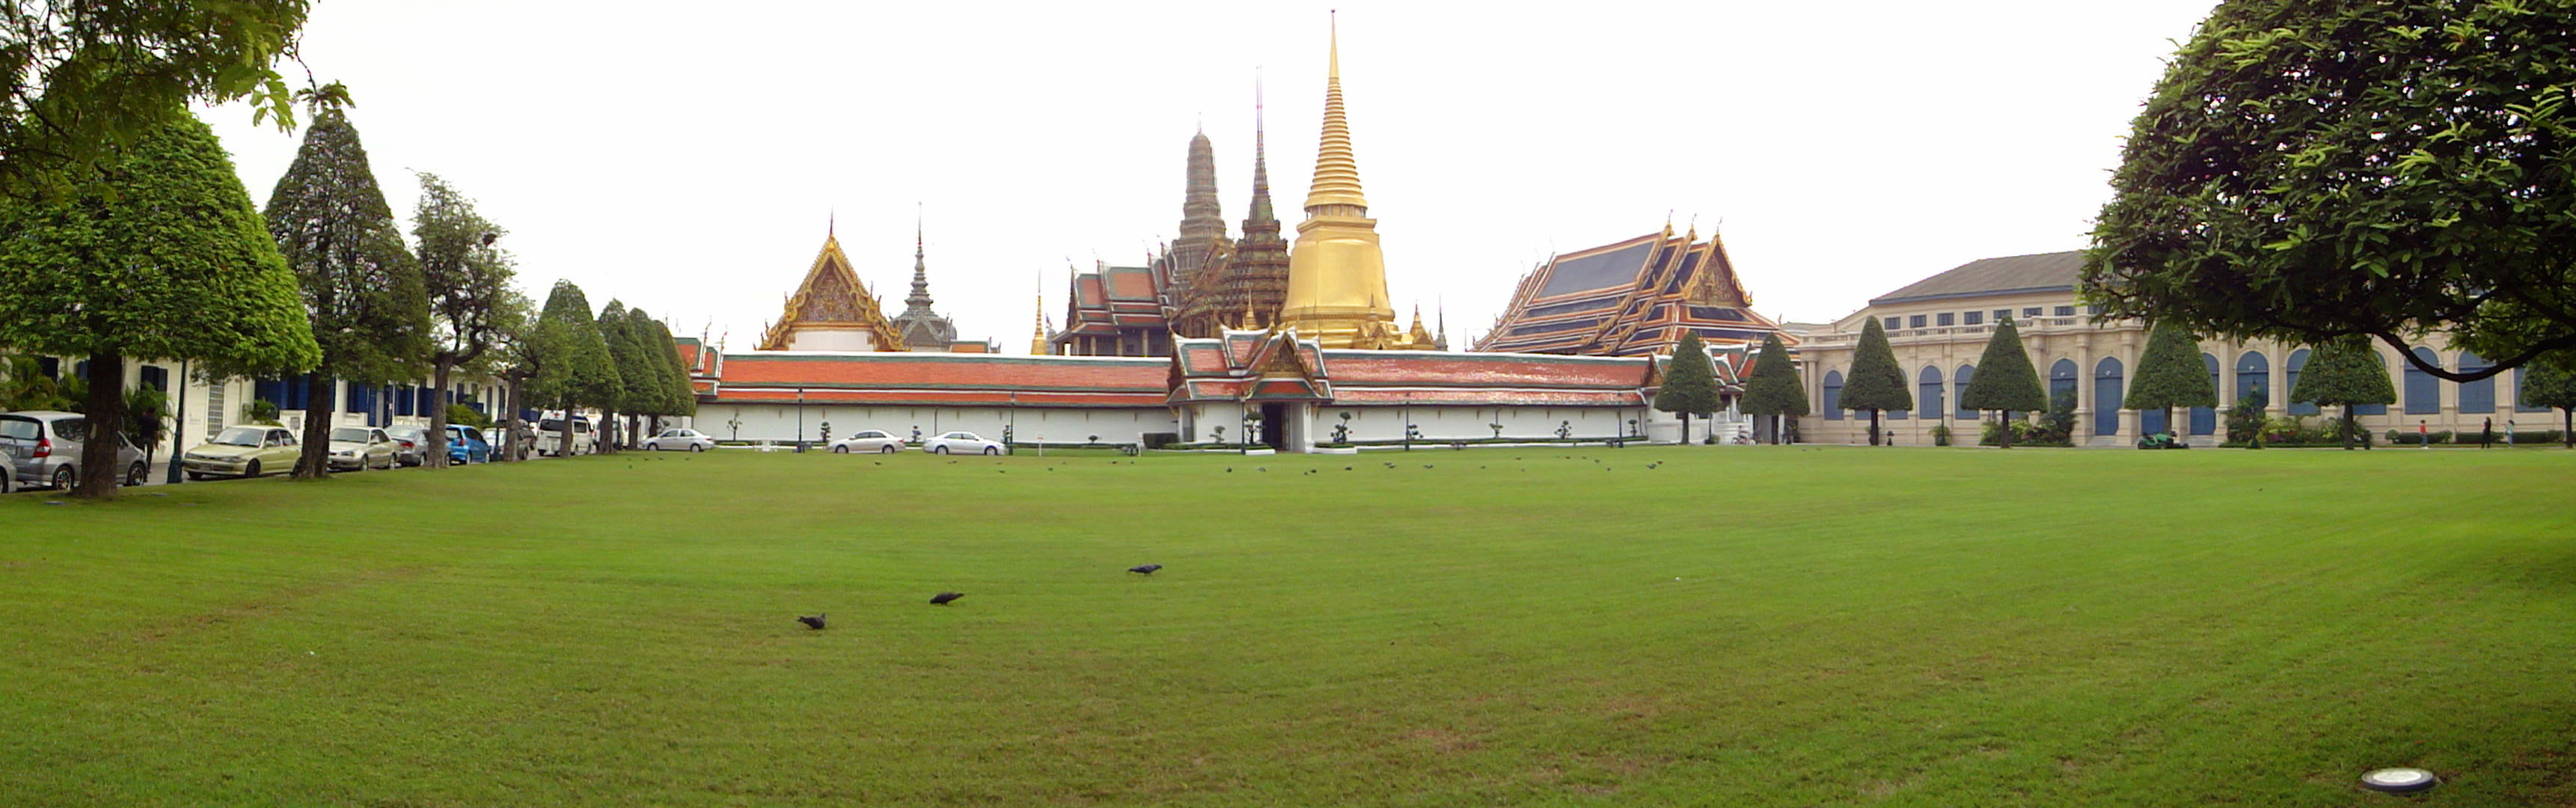 00 Viseschaisri Gate views Grand Palace Phra Borom Maha Ratcha Wang 02